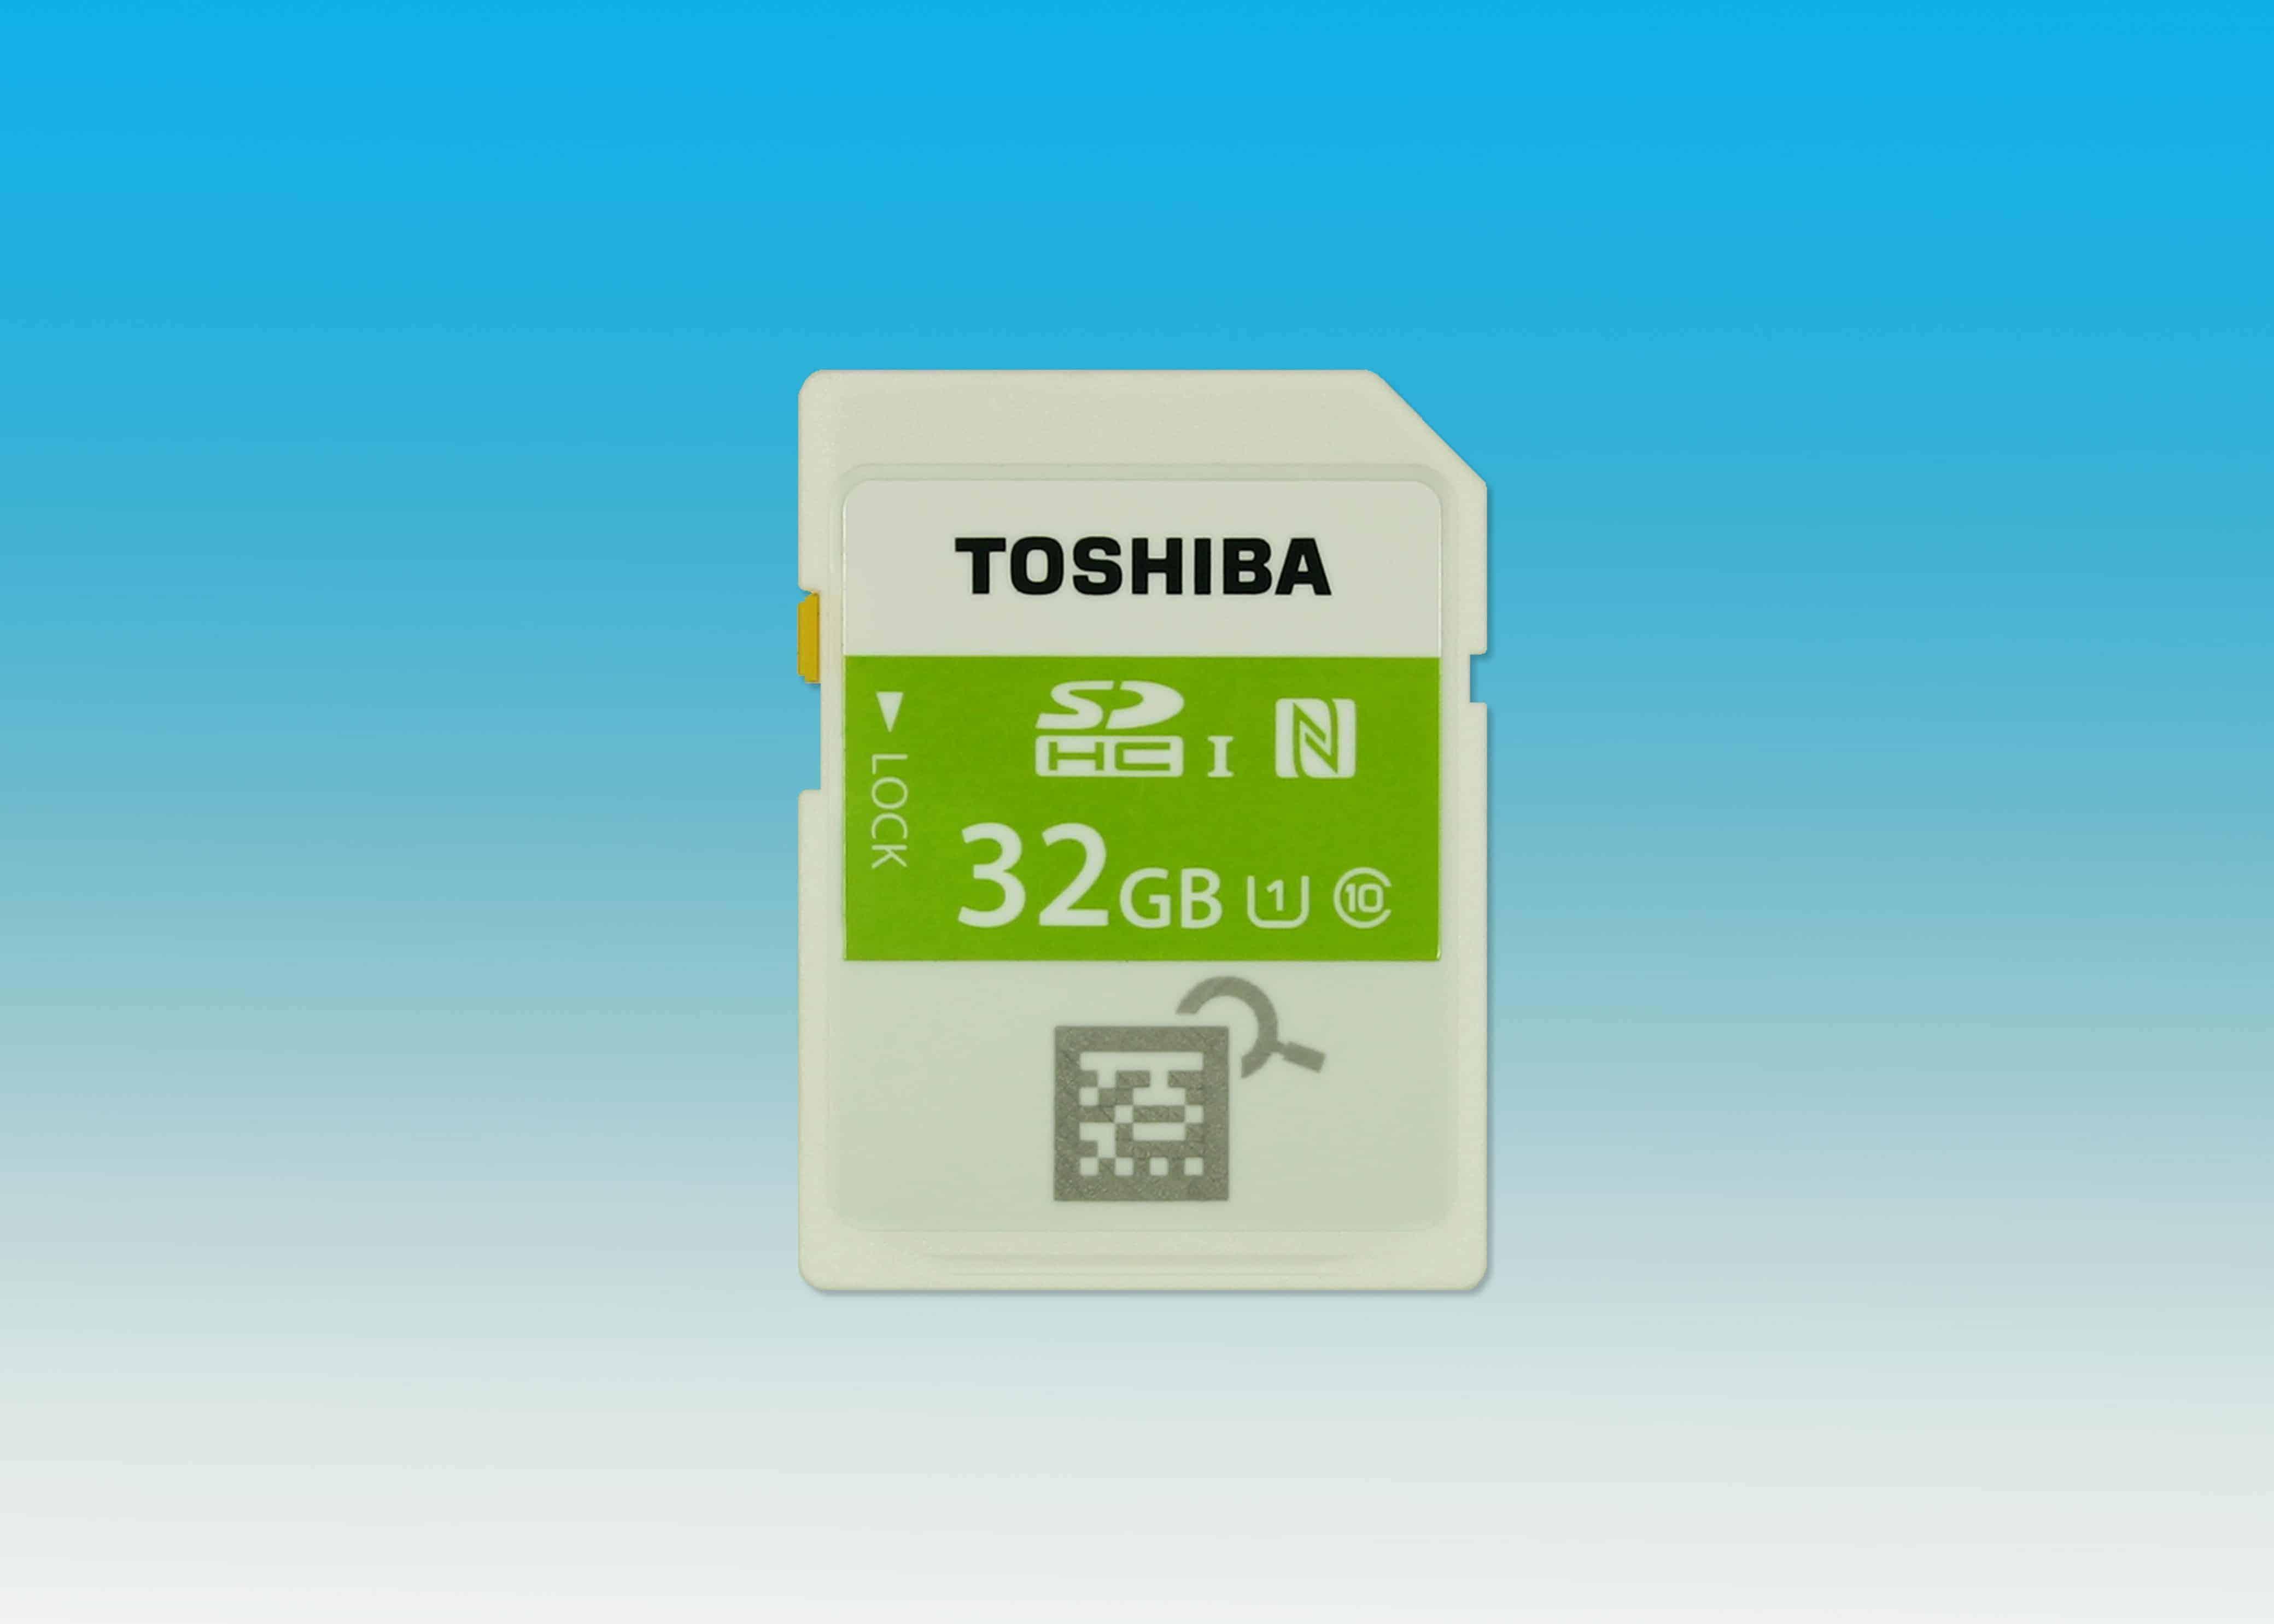 TOSHIBA_NFC_SD